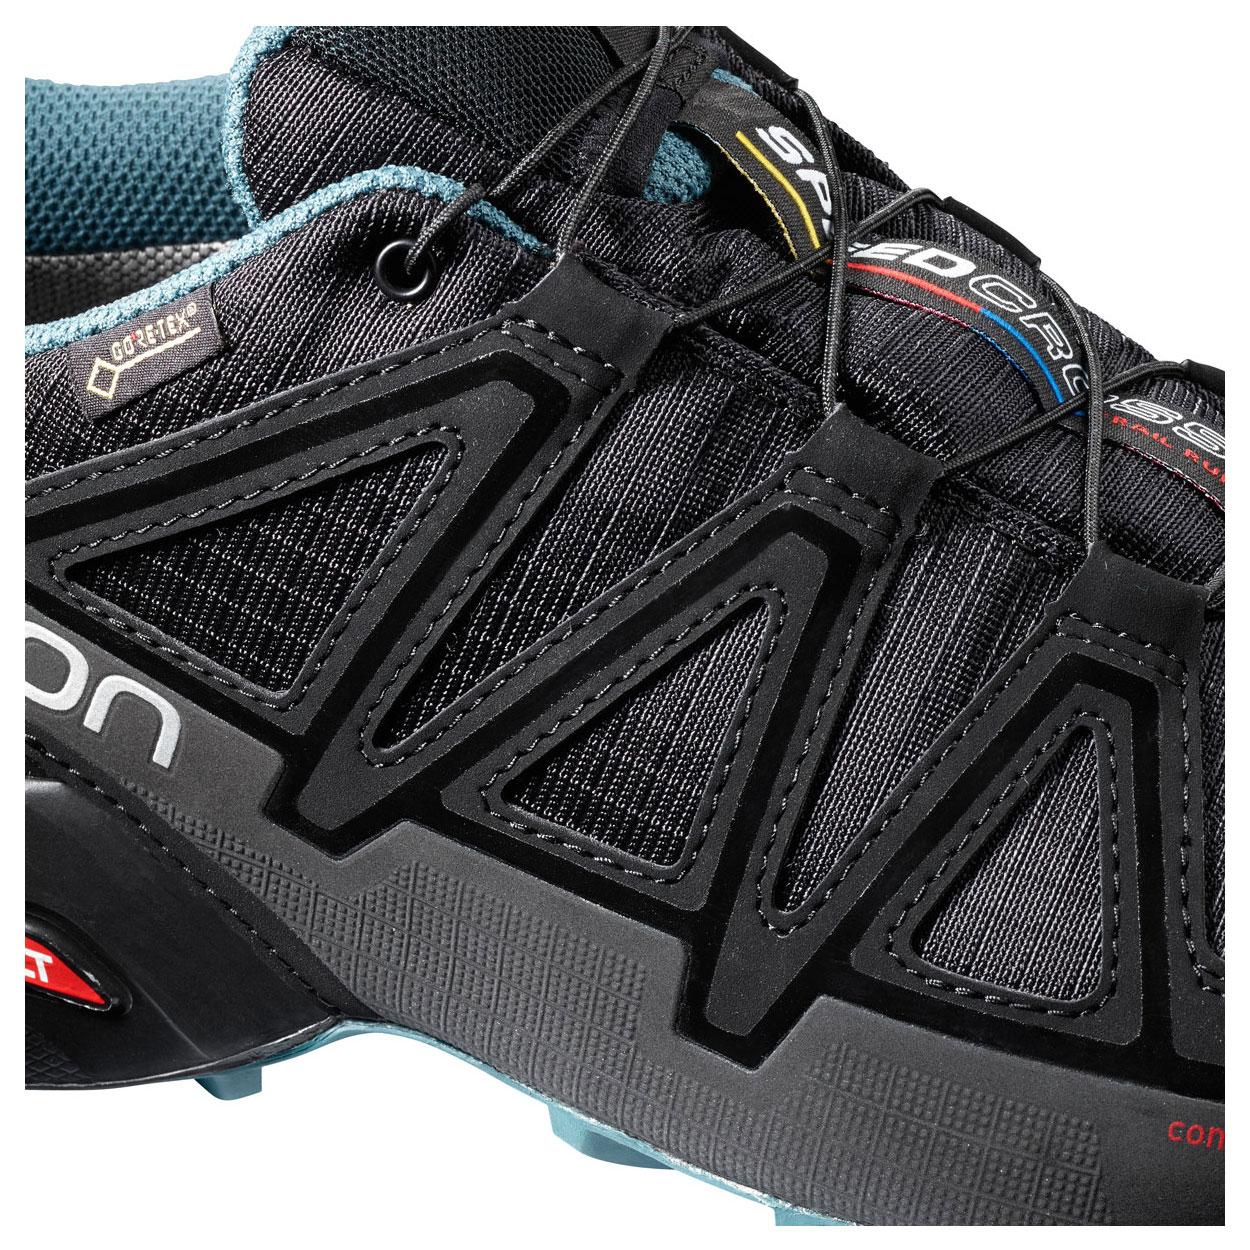 pretty nice 9149f aa8bd Salomon Speedcross 4 GTX Nocturne 2 - Unisex Trail Running Shoes